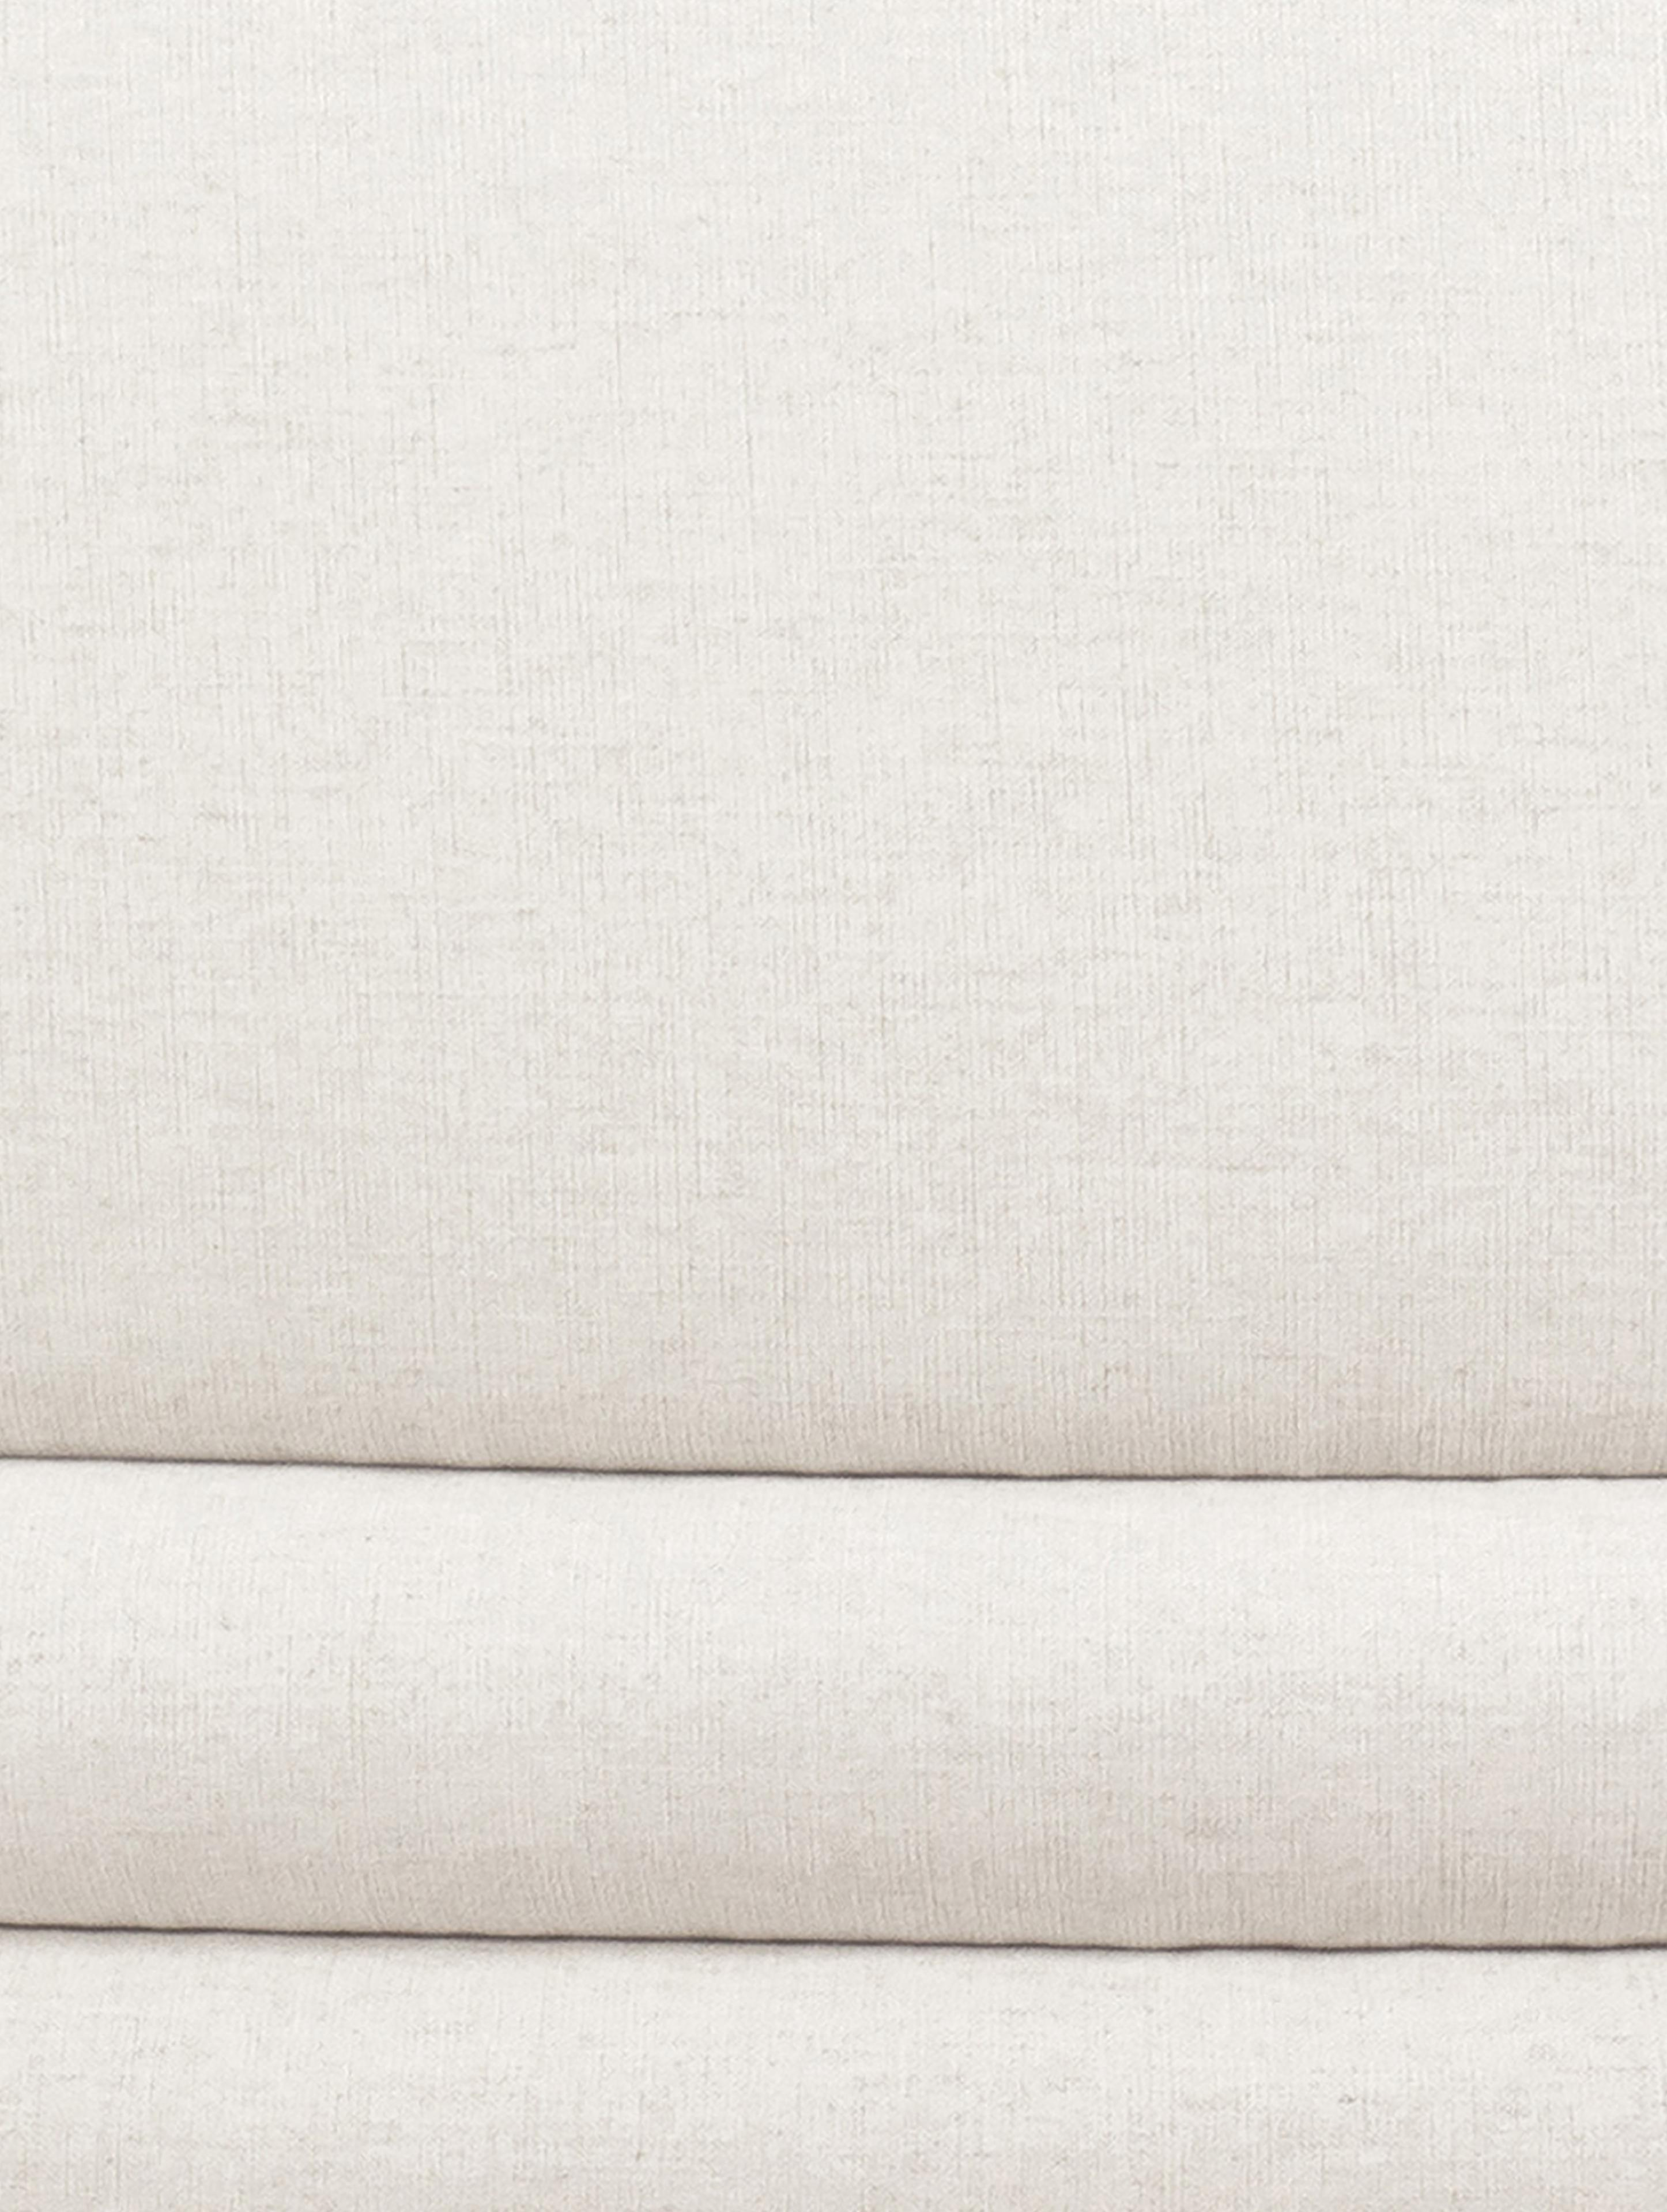 Sofá Solomon (3plazas), Tapizado: 56%viscosa, 21%poliéste, Tapizado: relleno de espuma, Estructura: madera de abeto maciza, m, Patas: plástico, Beige, negro, An 200 x F 95 cm